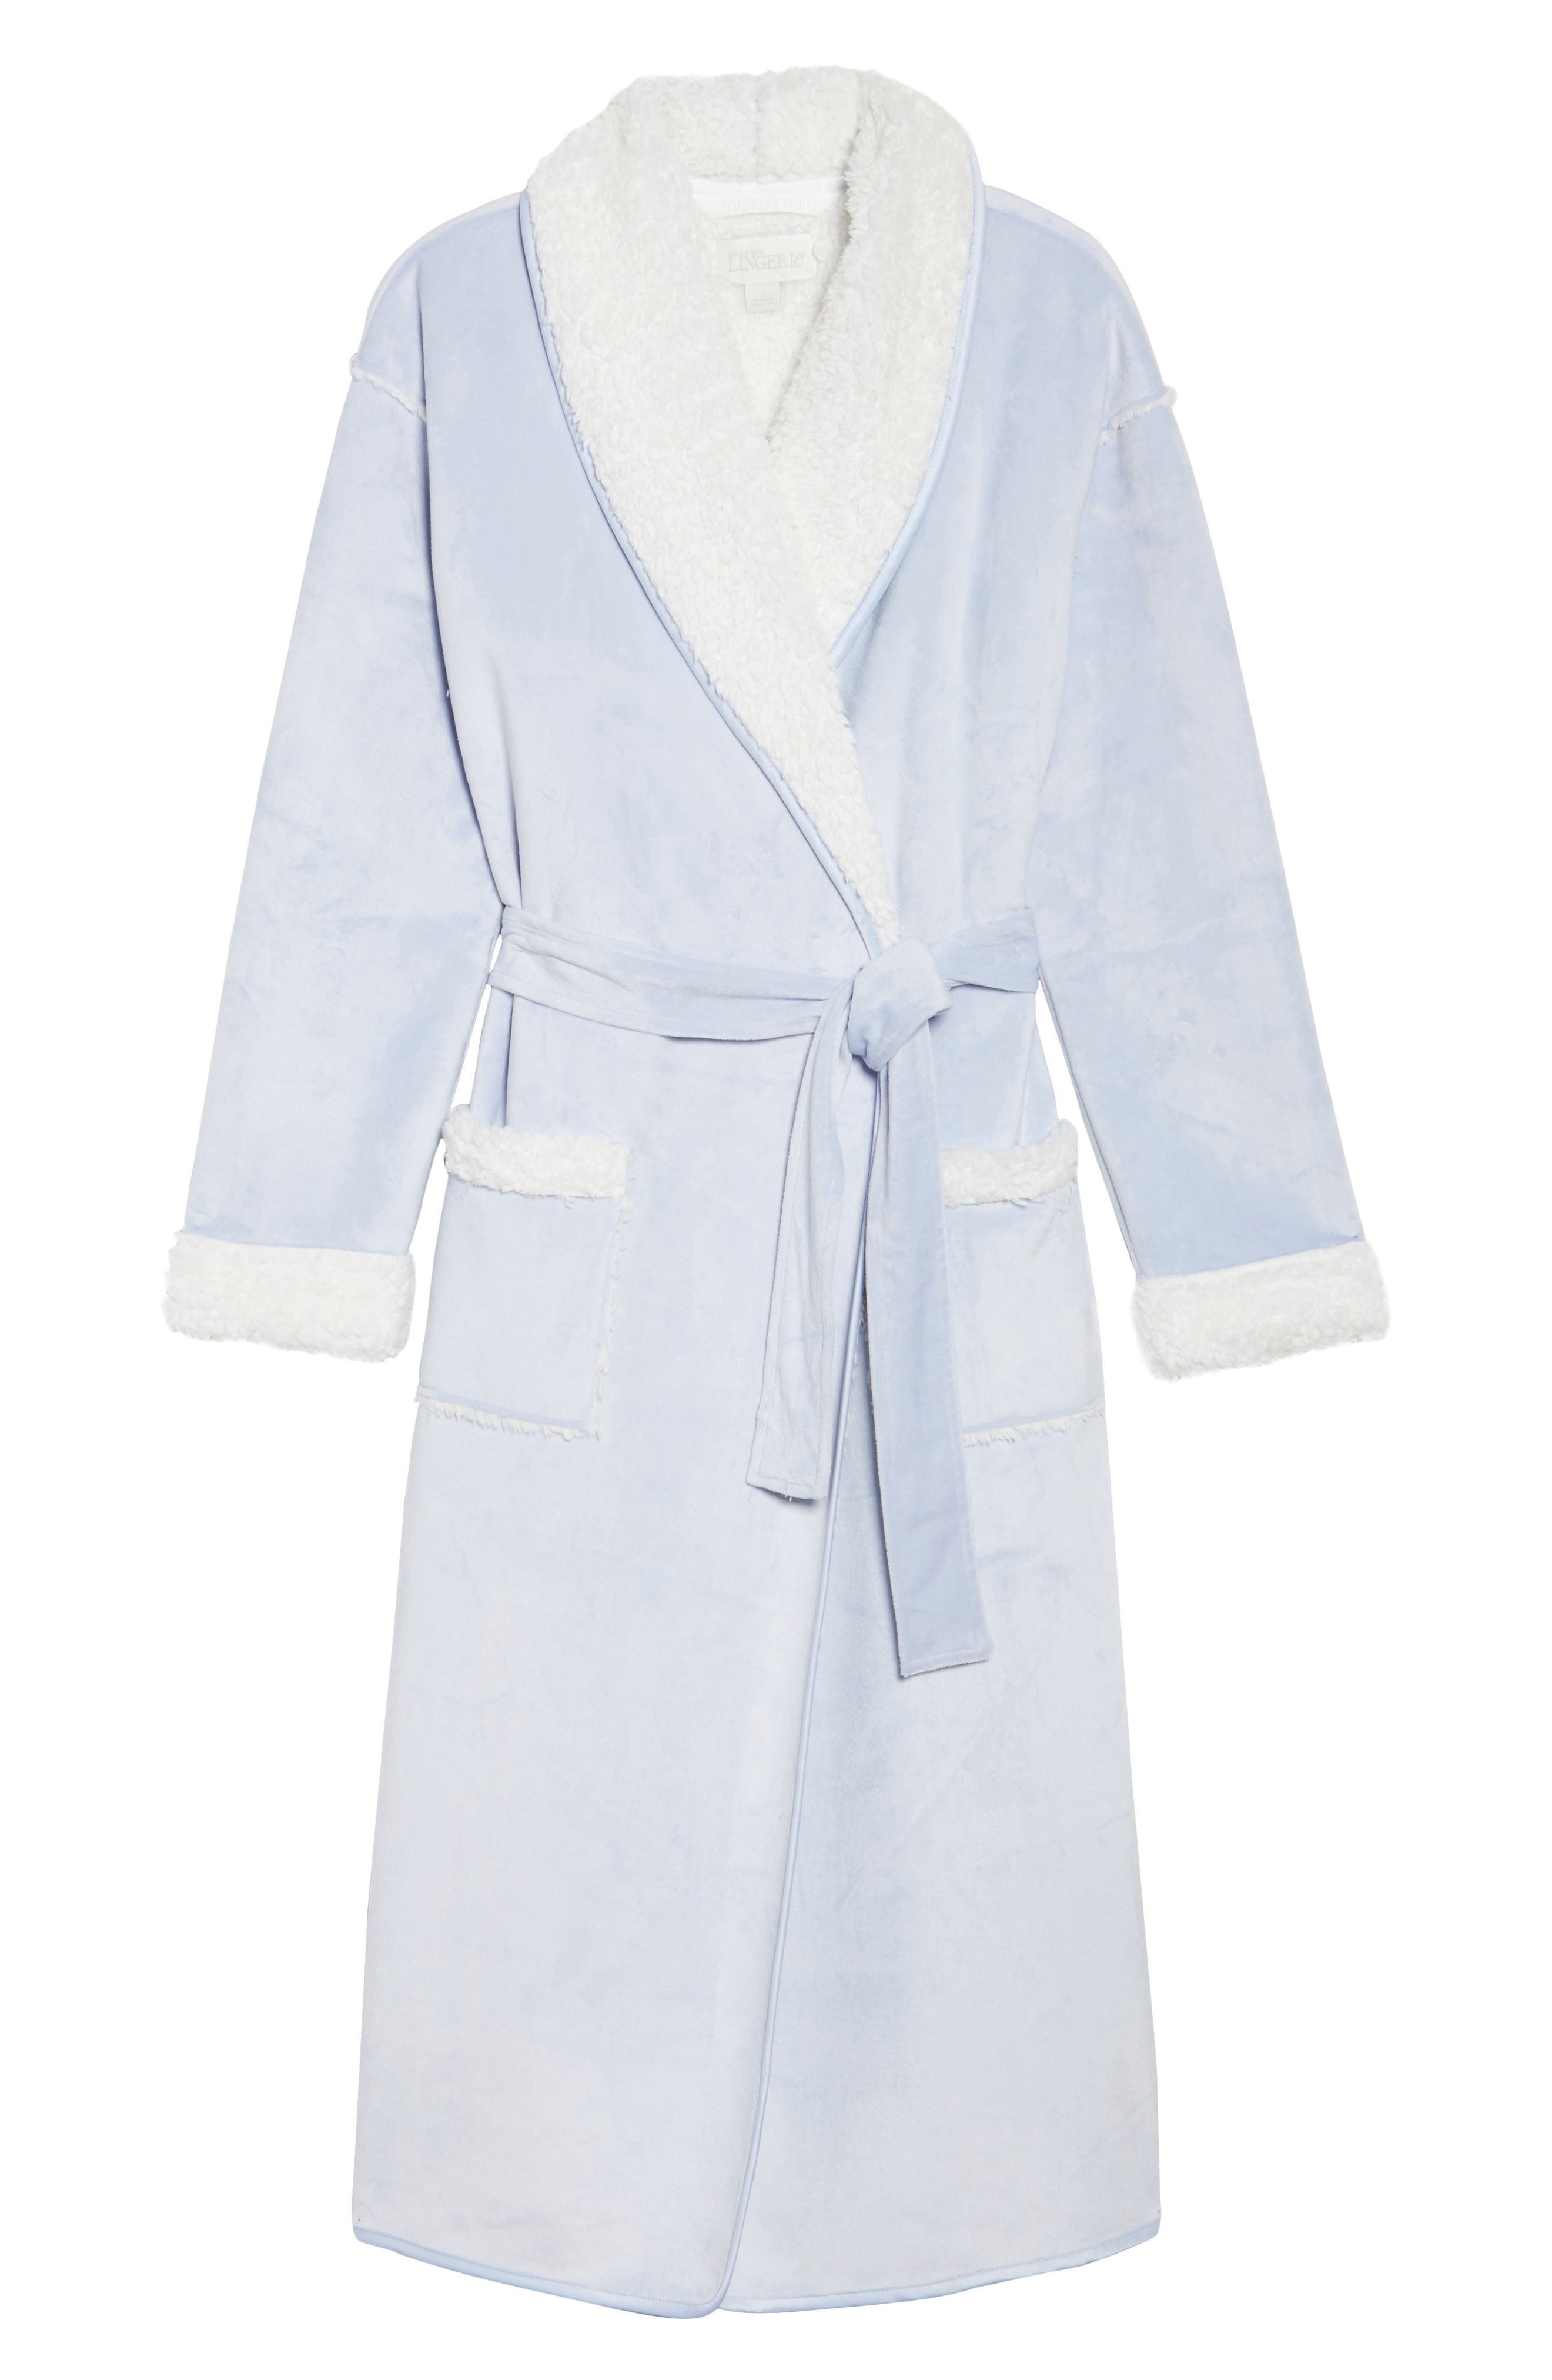 Wintertide Plush Robe,                             Alternate thumbnail 4, color,                             Blue Xenon